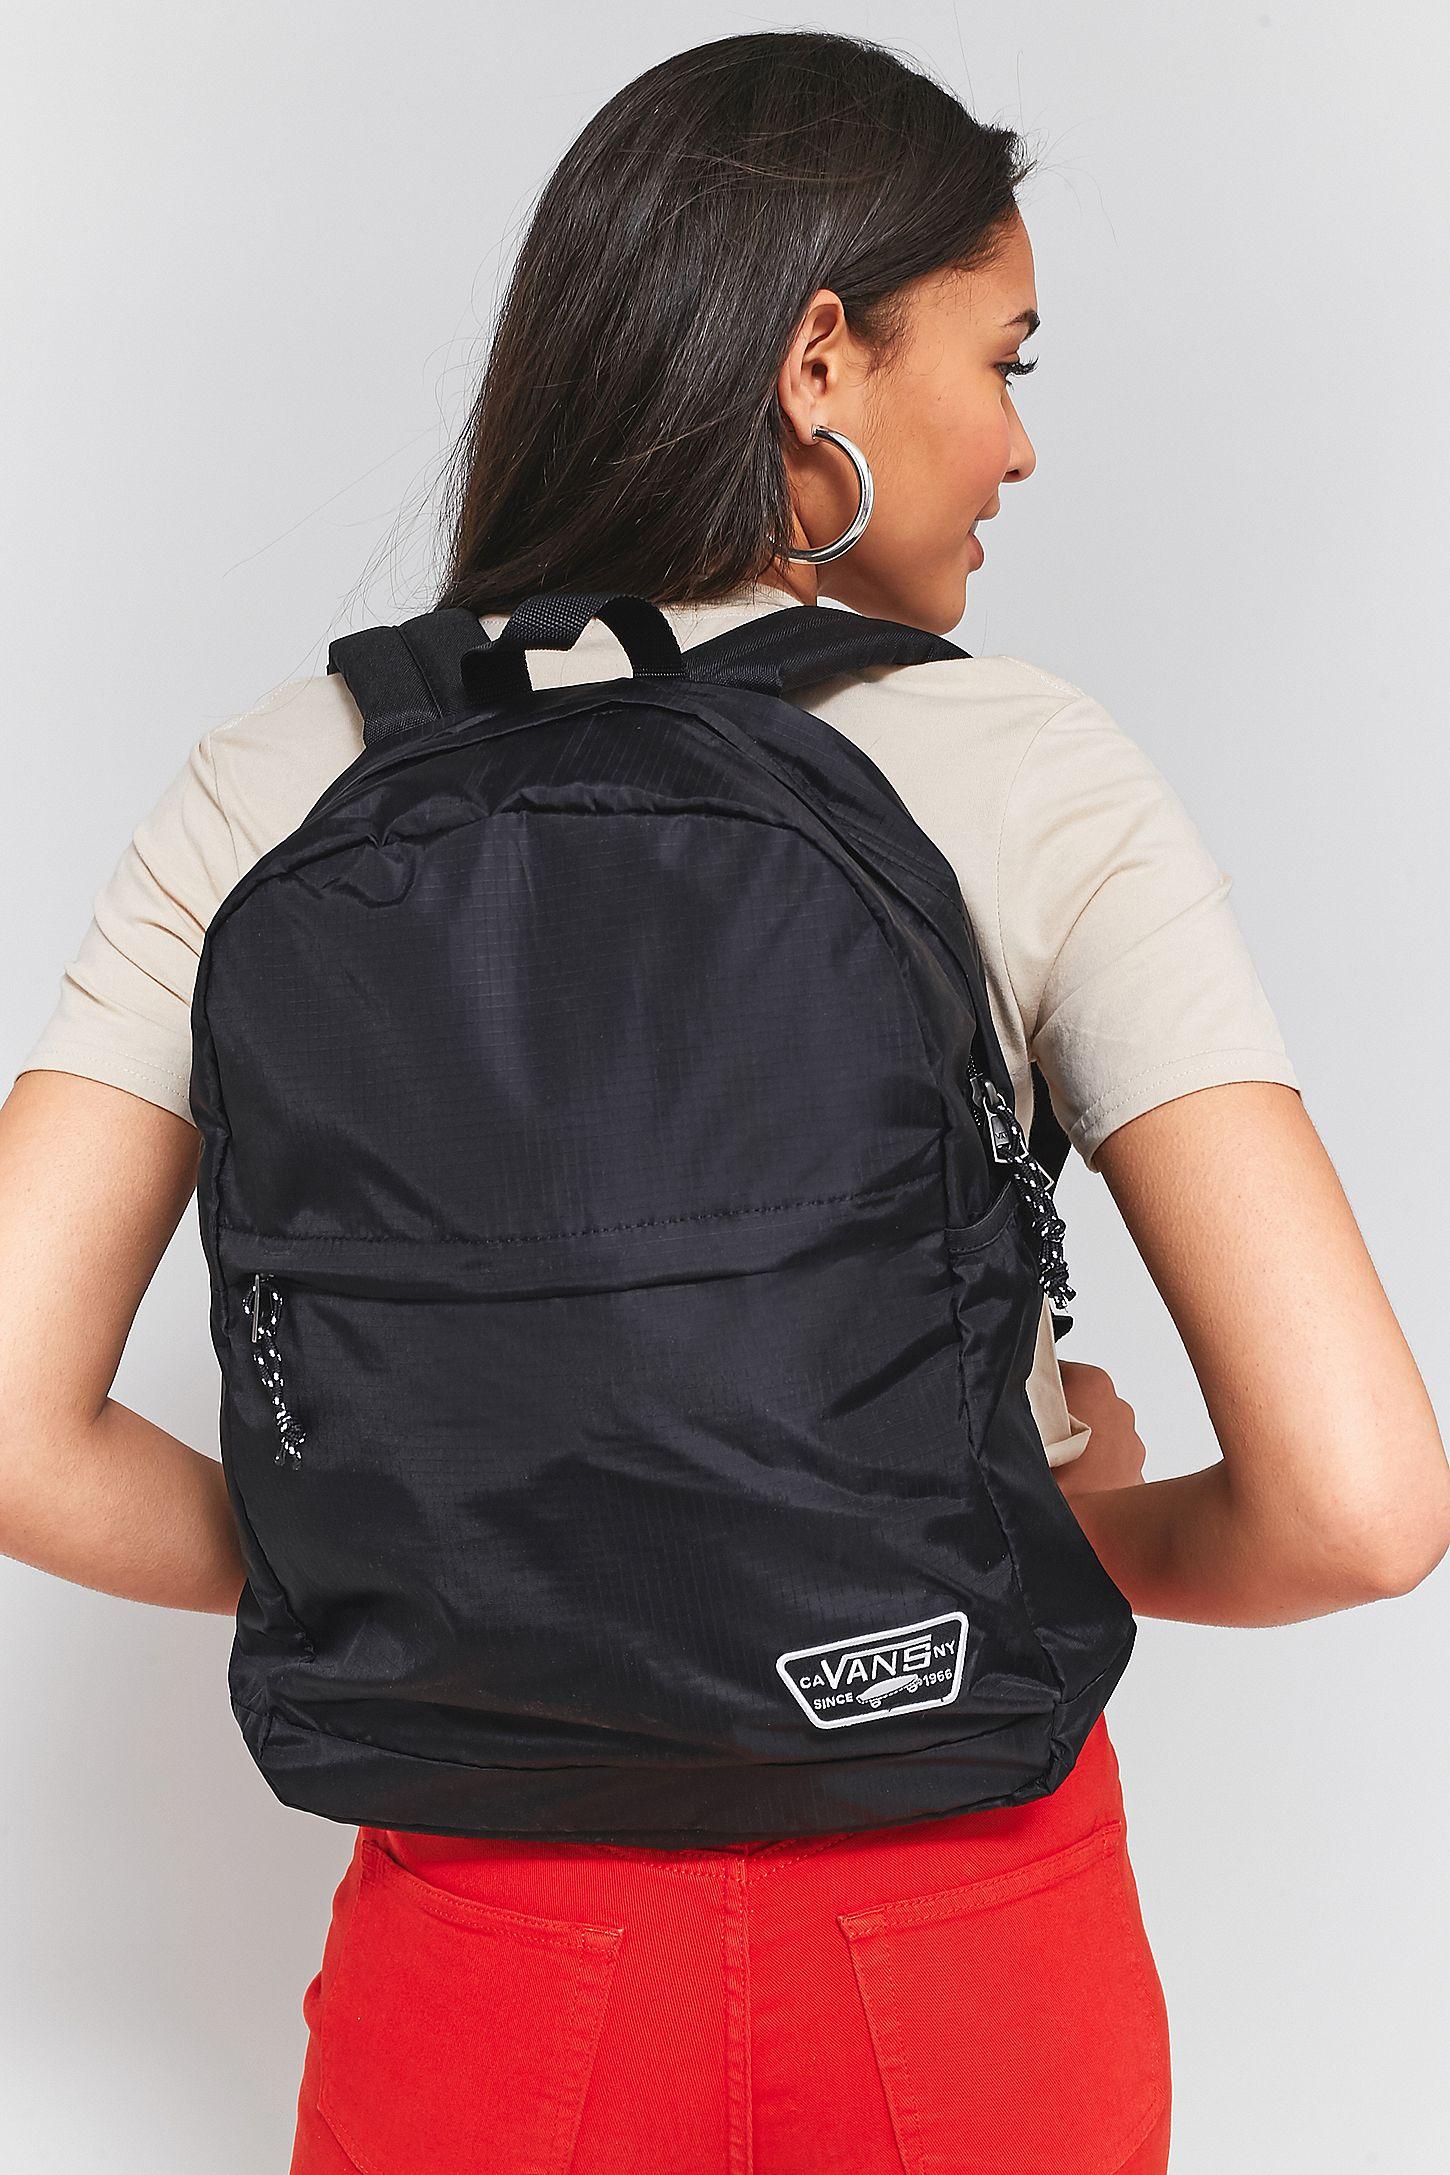 2c45b051fcdbcd Vans Pep Squad Black Backpack